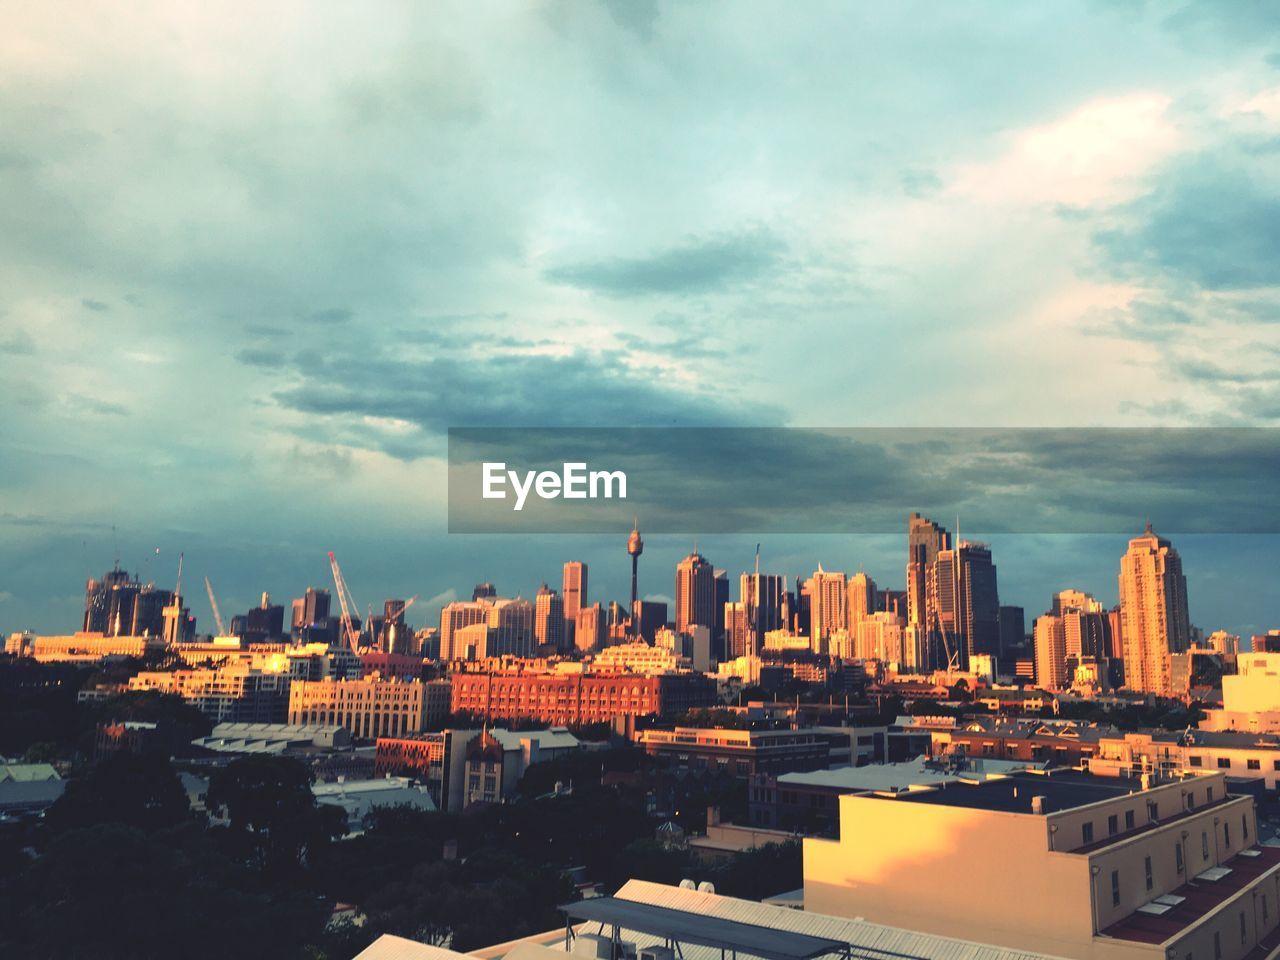 cityscape, cloud - sky, architecture, building exterior, sky, skyscraper, city, built structure, no people, outdoors, urban skyline, day